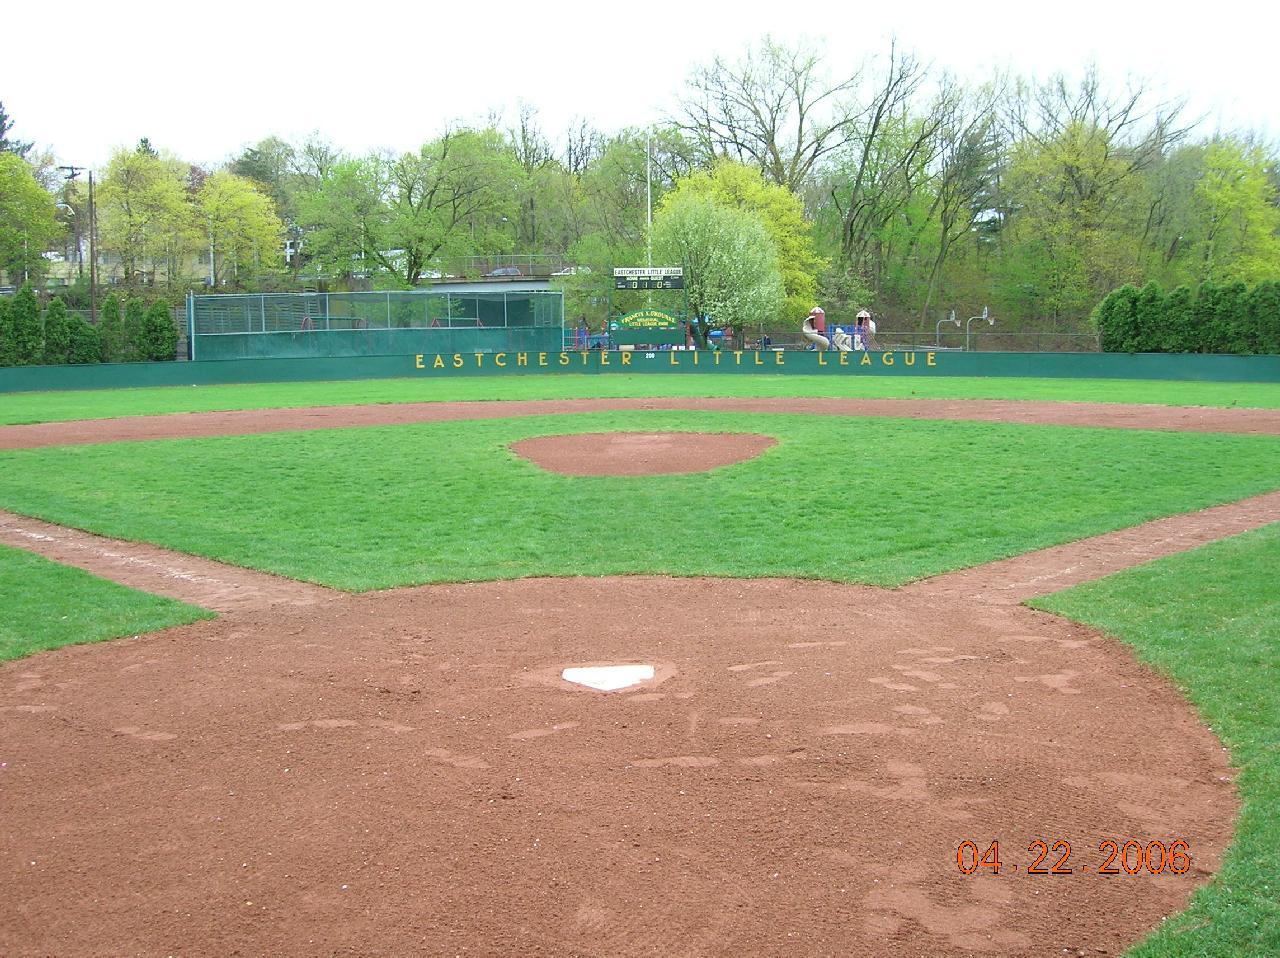 Little league baseball field images